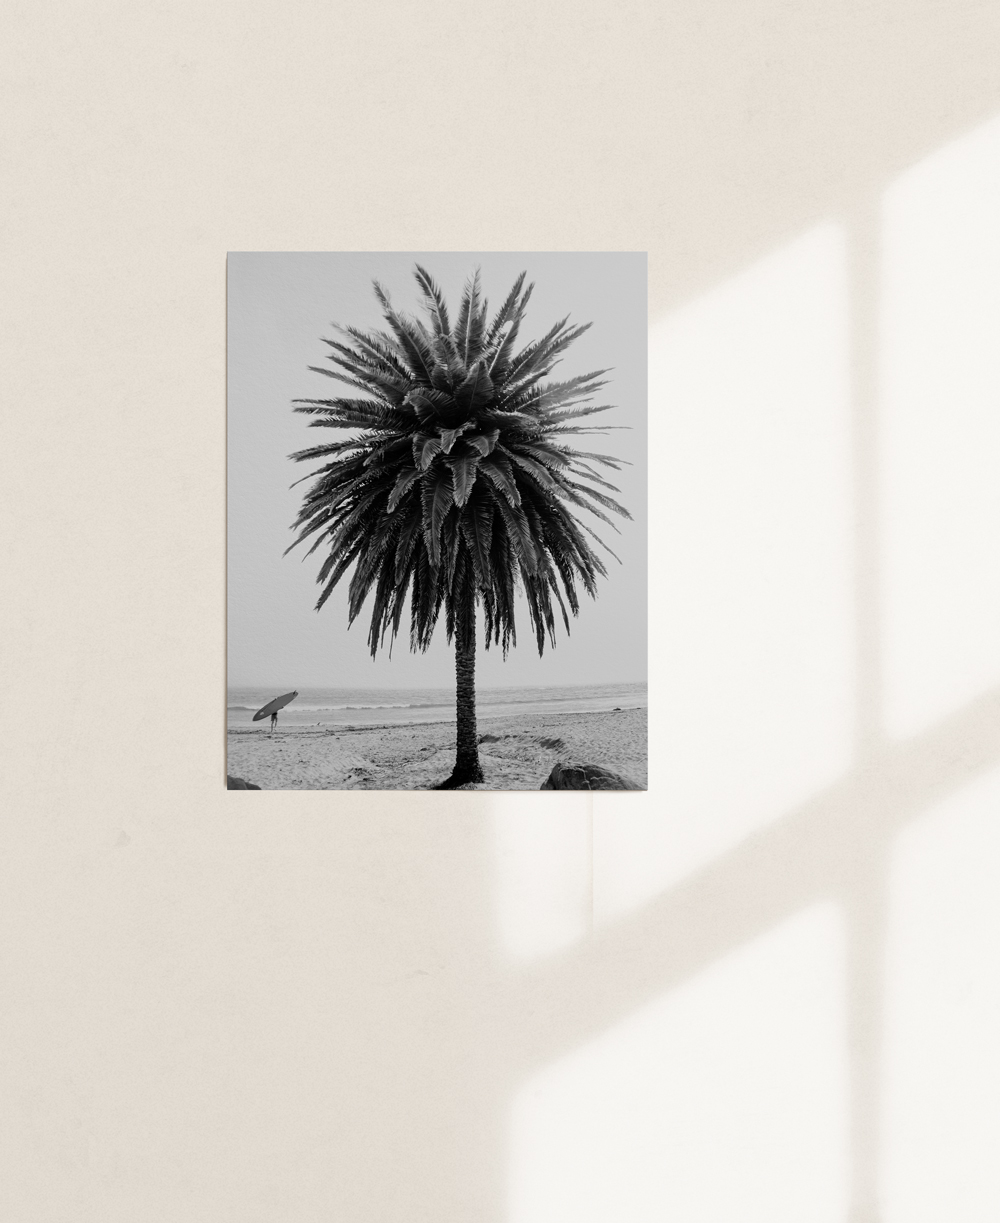 nicischwab-prints-02-019